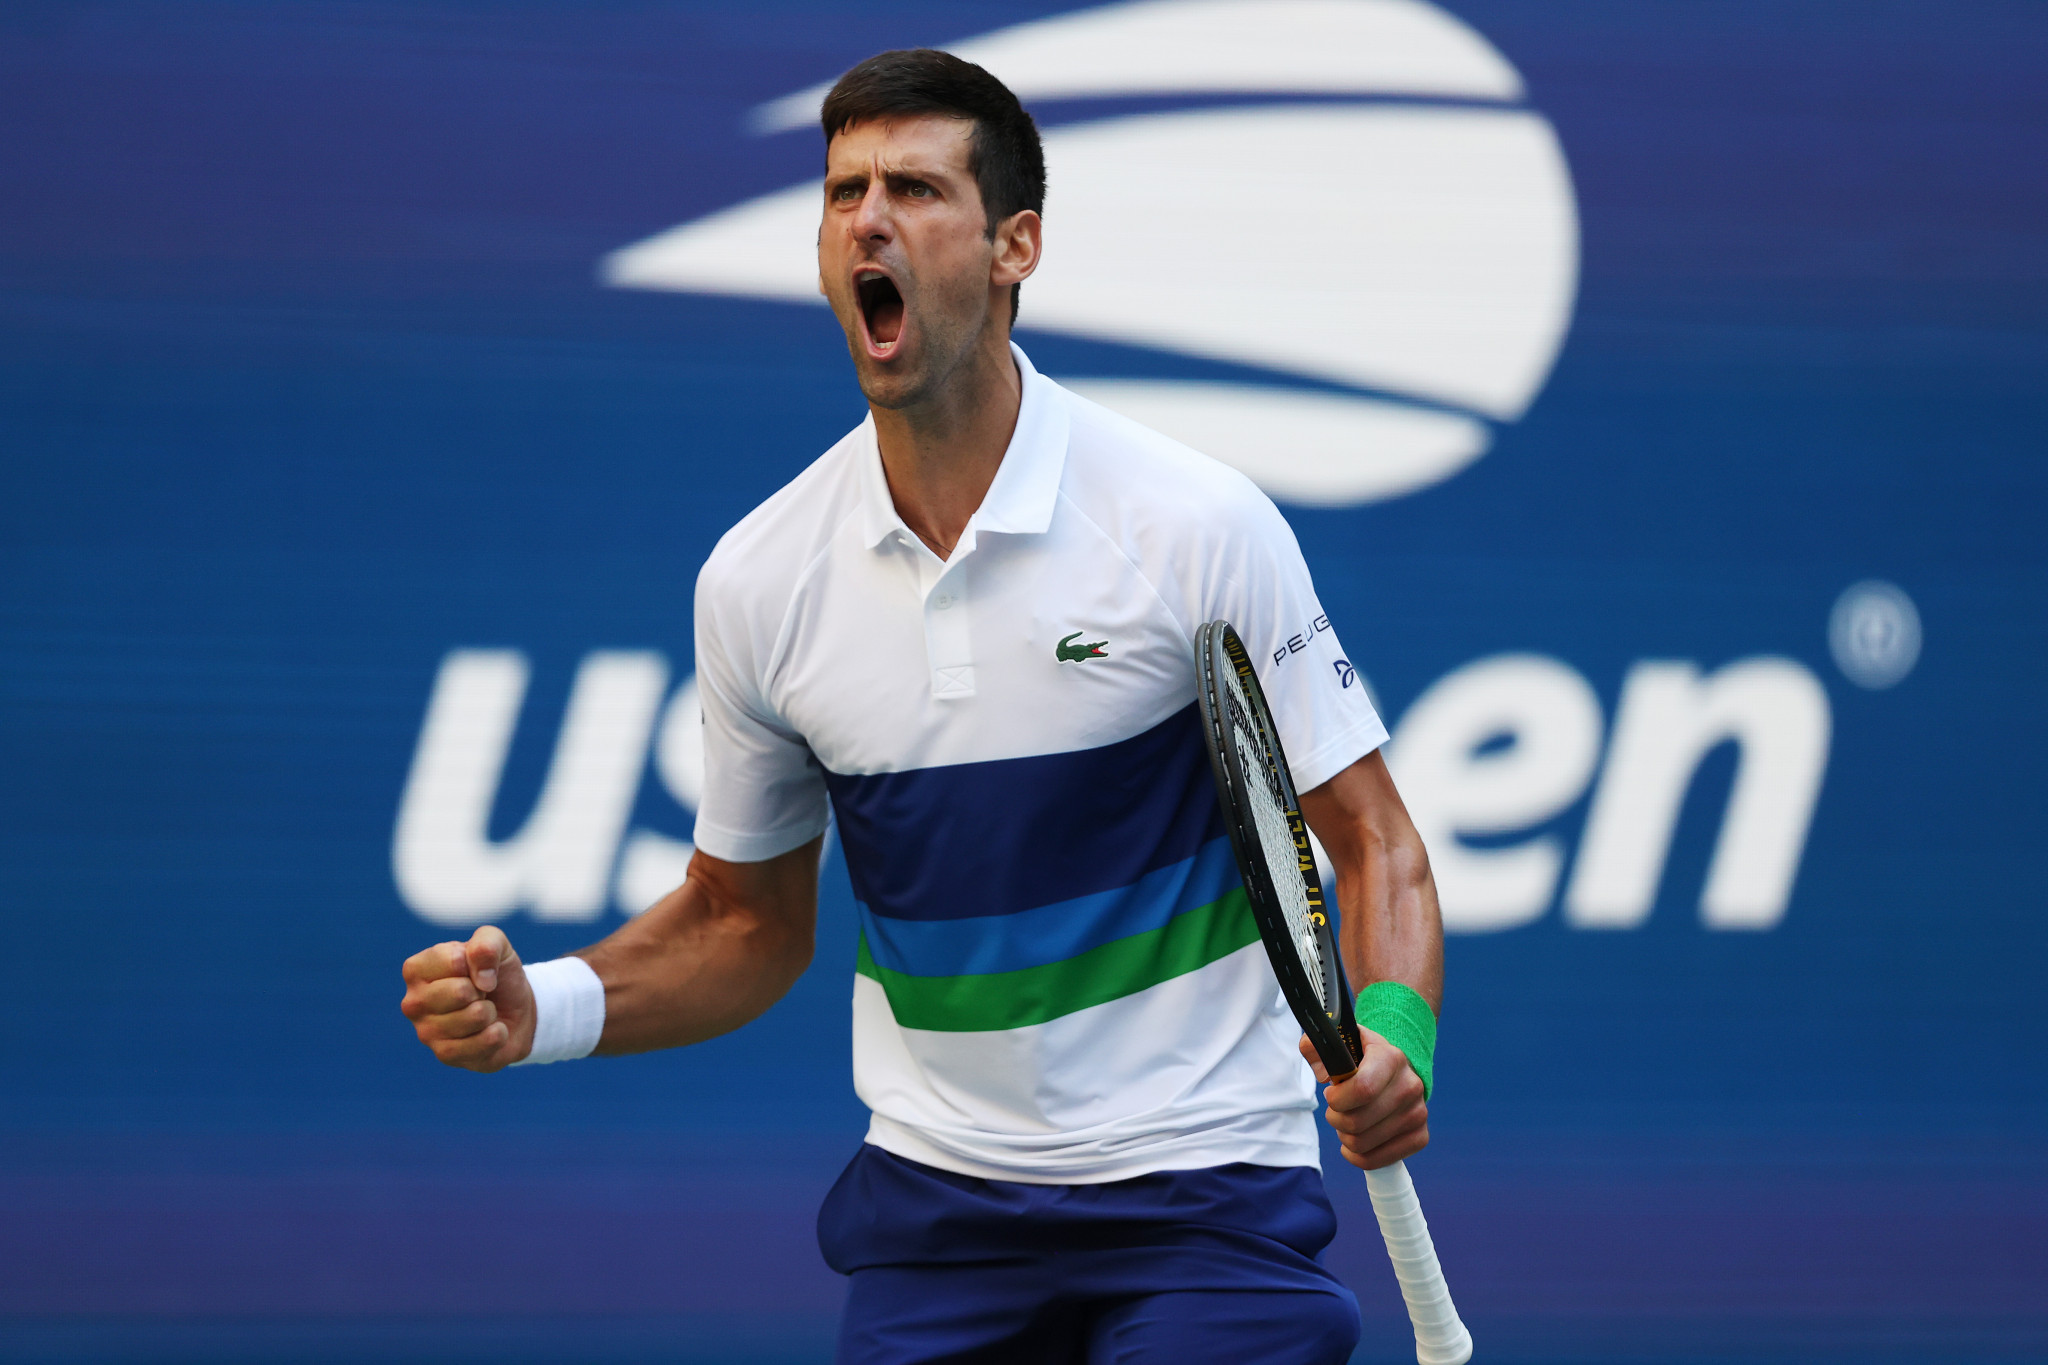 Djokovic continues calendar Grand Slam bid with victory over Nishikori in US Open men's singles third round